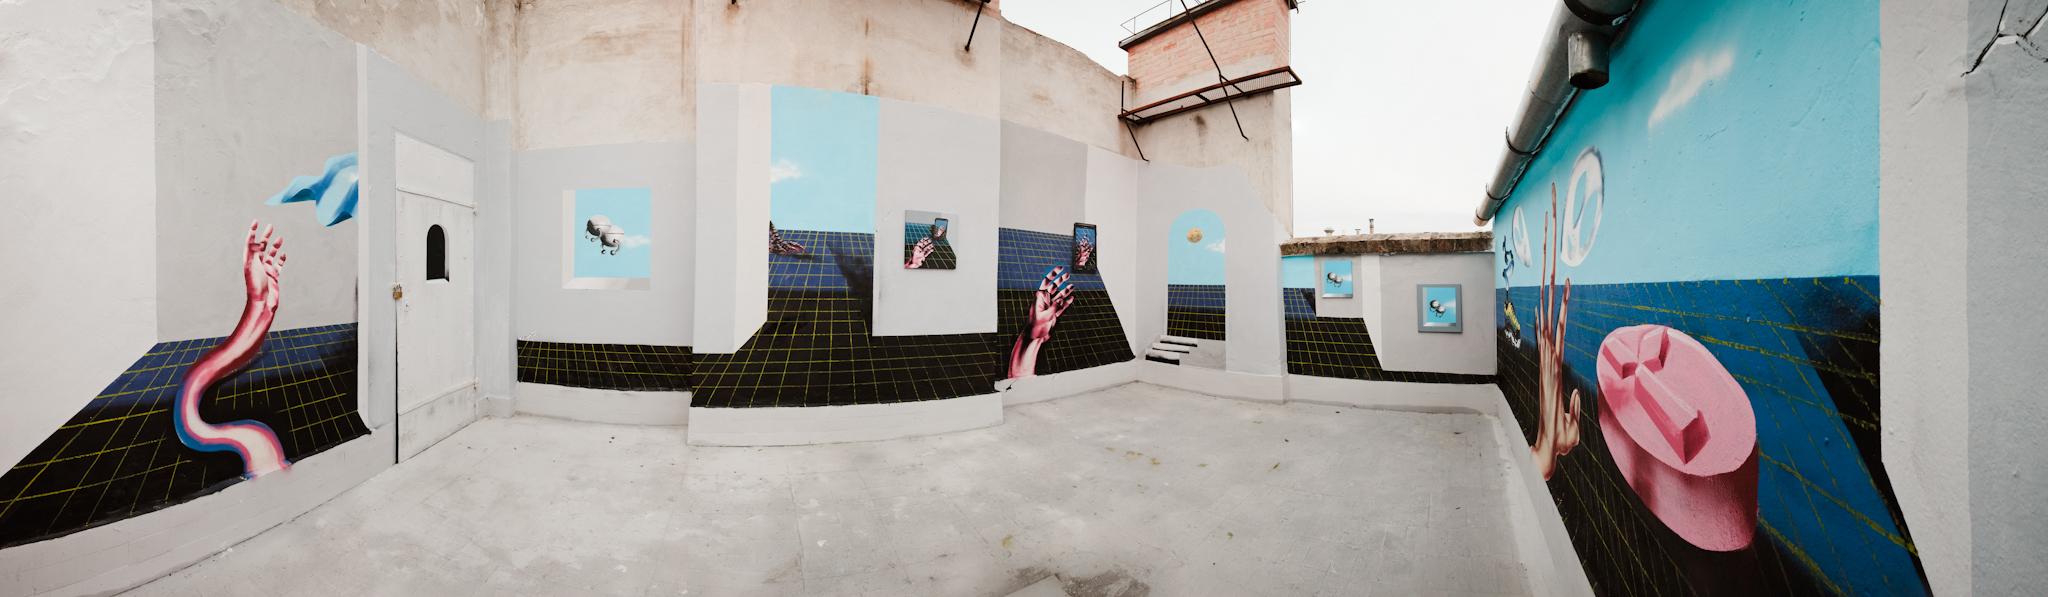 botond_keresztesi_fps-future_past_sunday_ena_viewing_space_budapest_panorama_photo_aron_weber.jpg